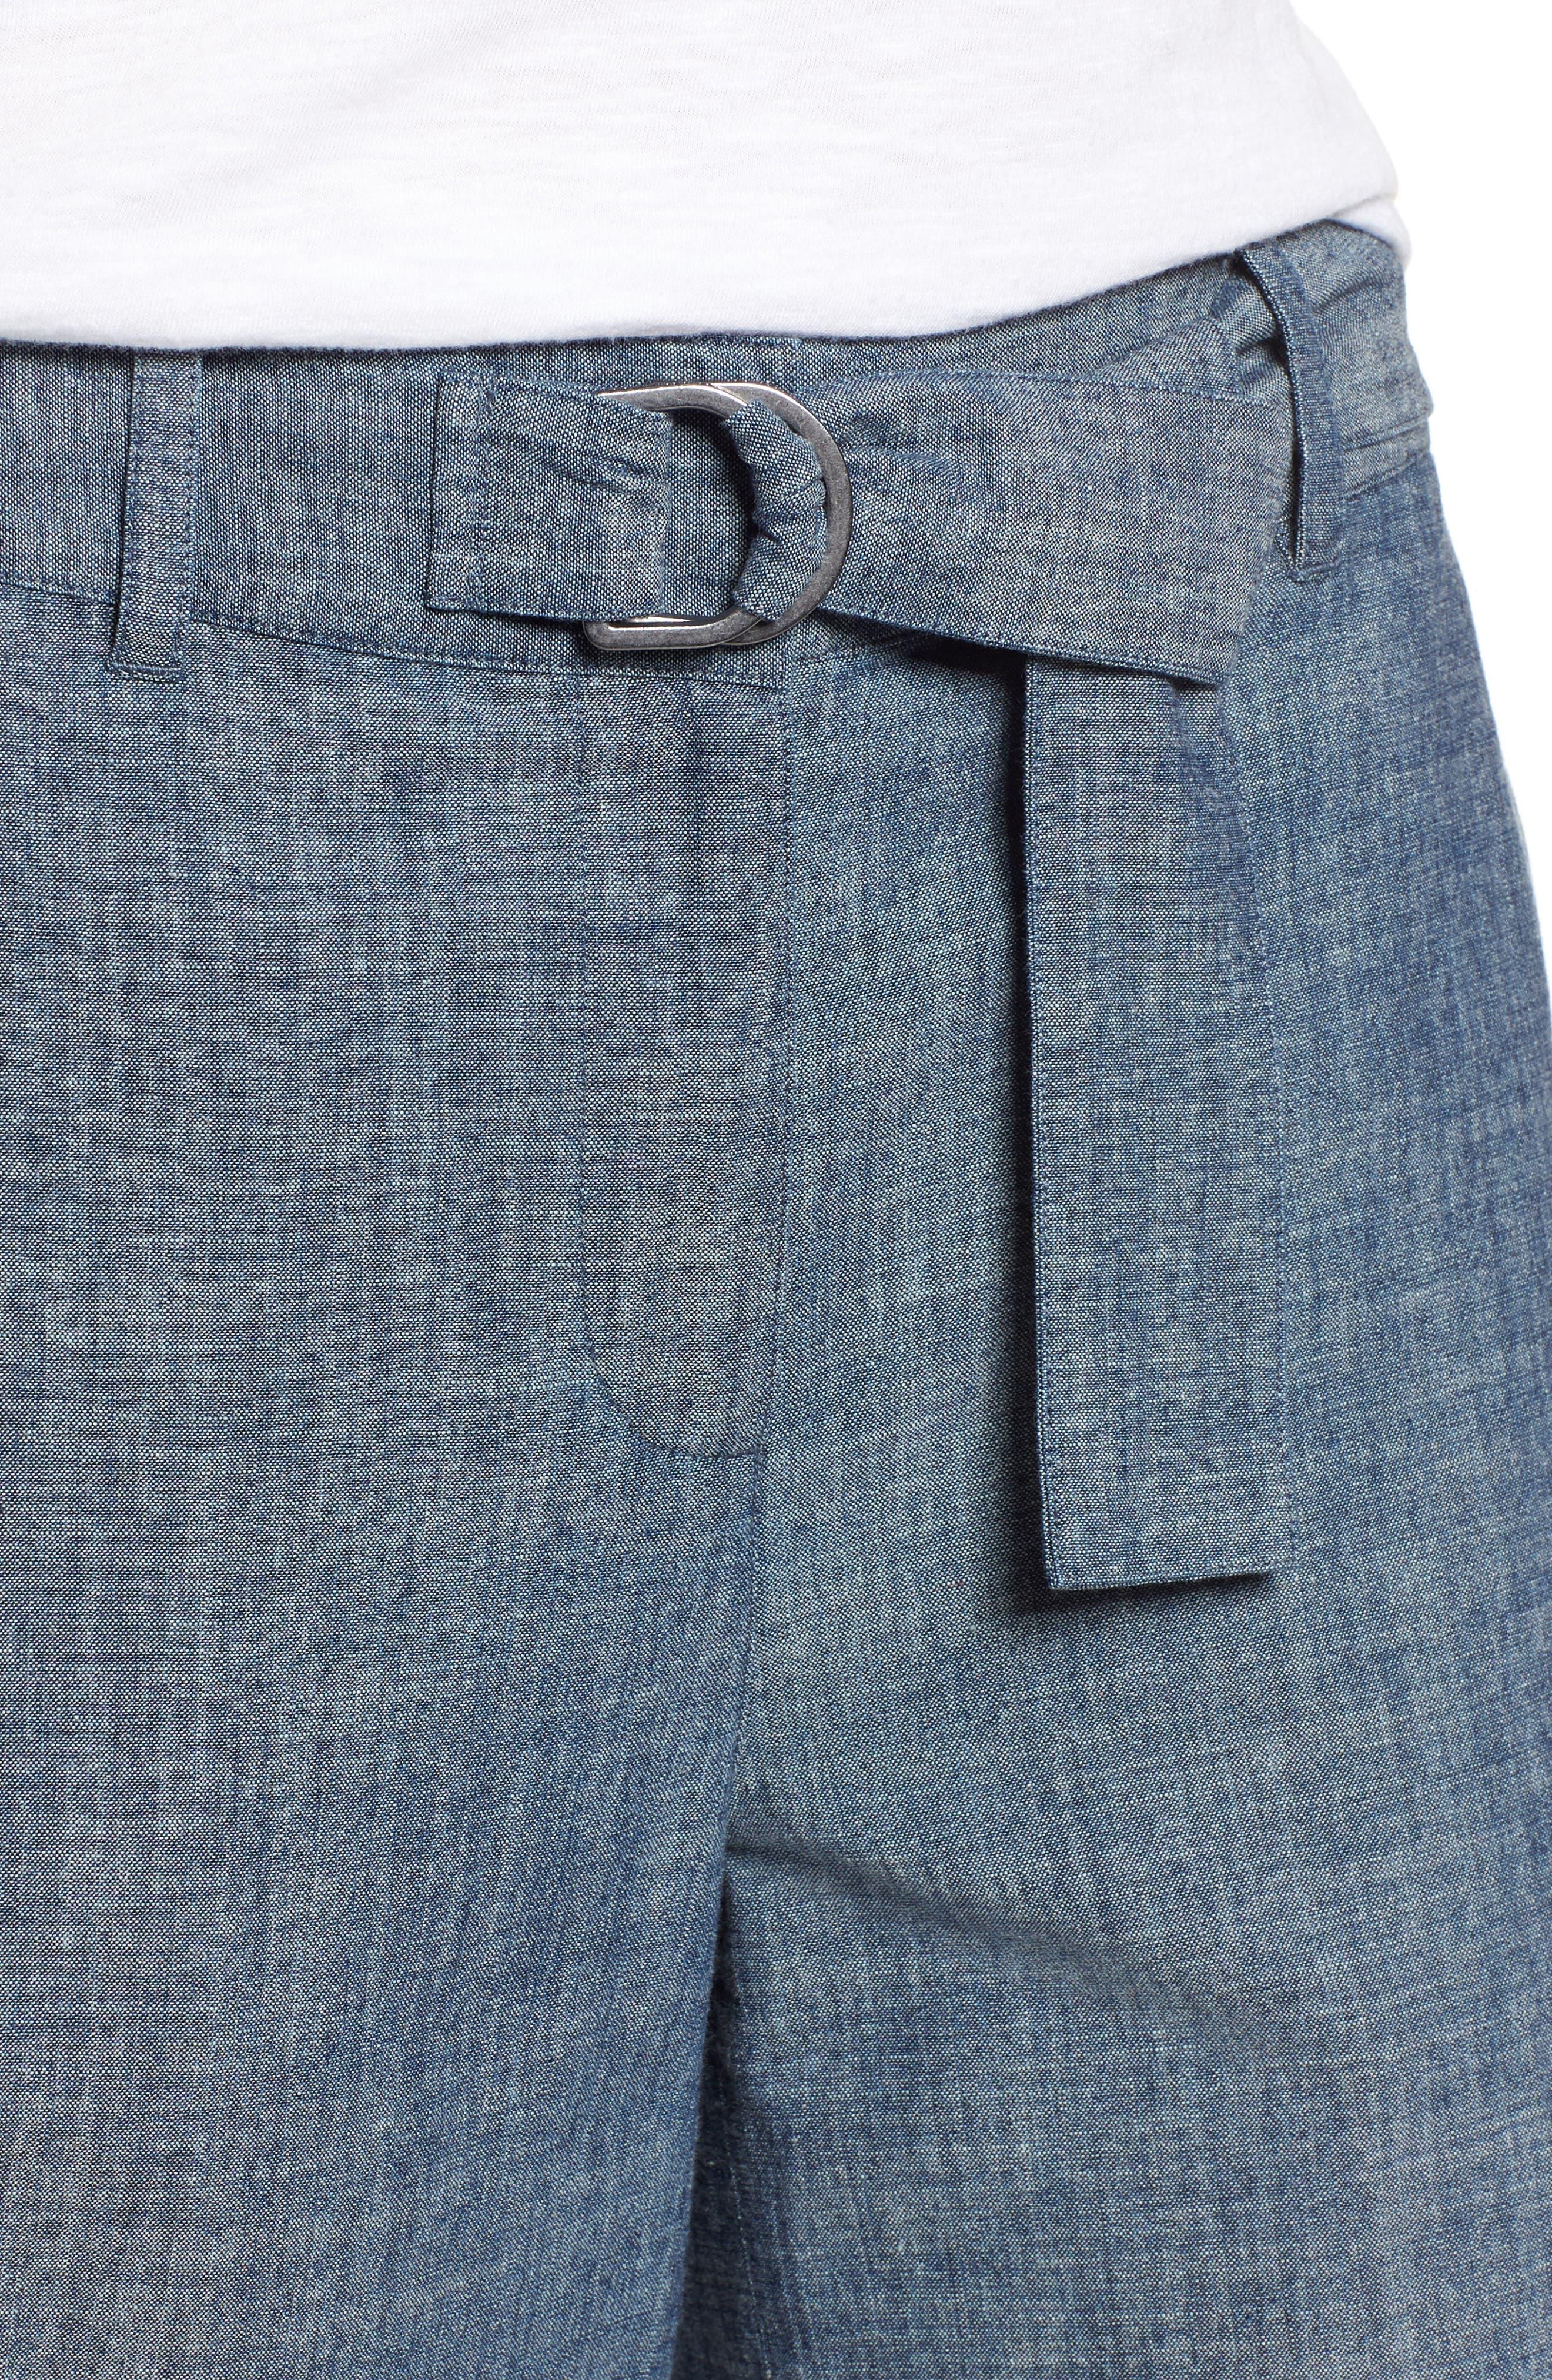 Wide Leg Crop Pants,                             Alternate thumbnail 4, color,                             Textured Navy